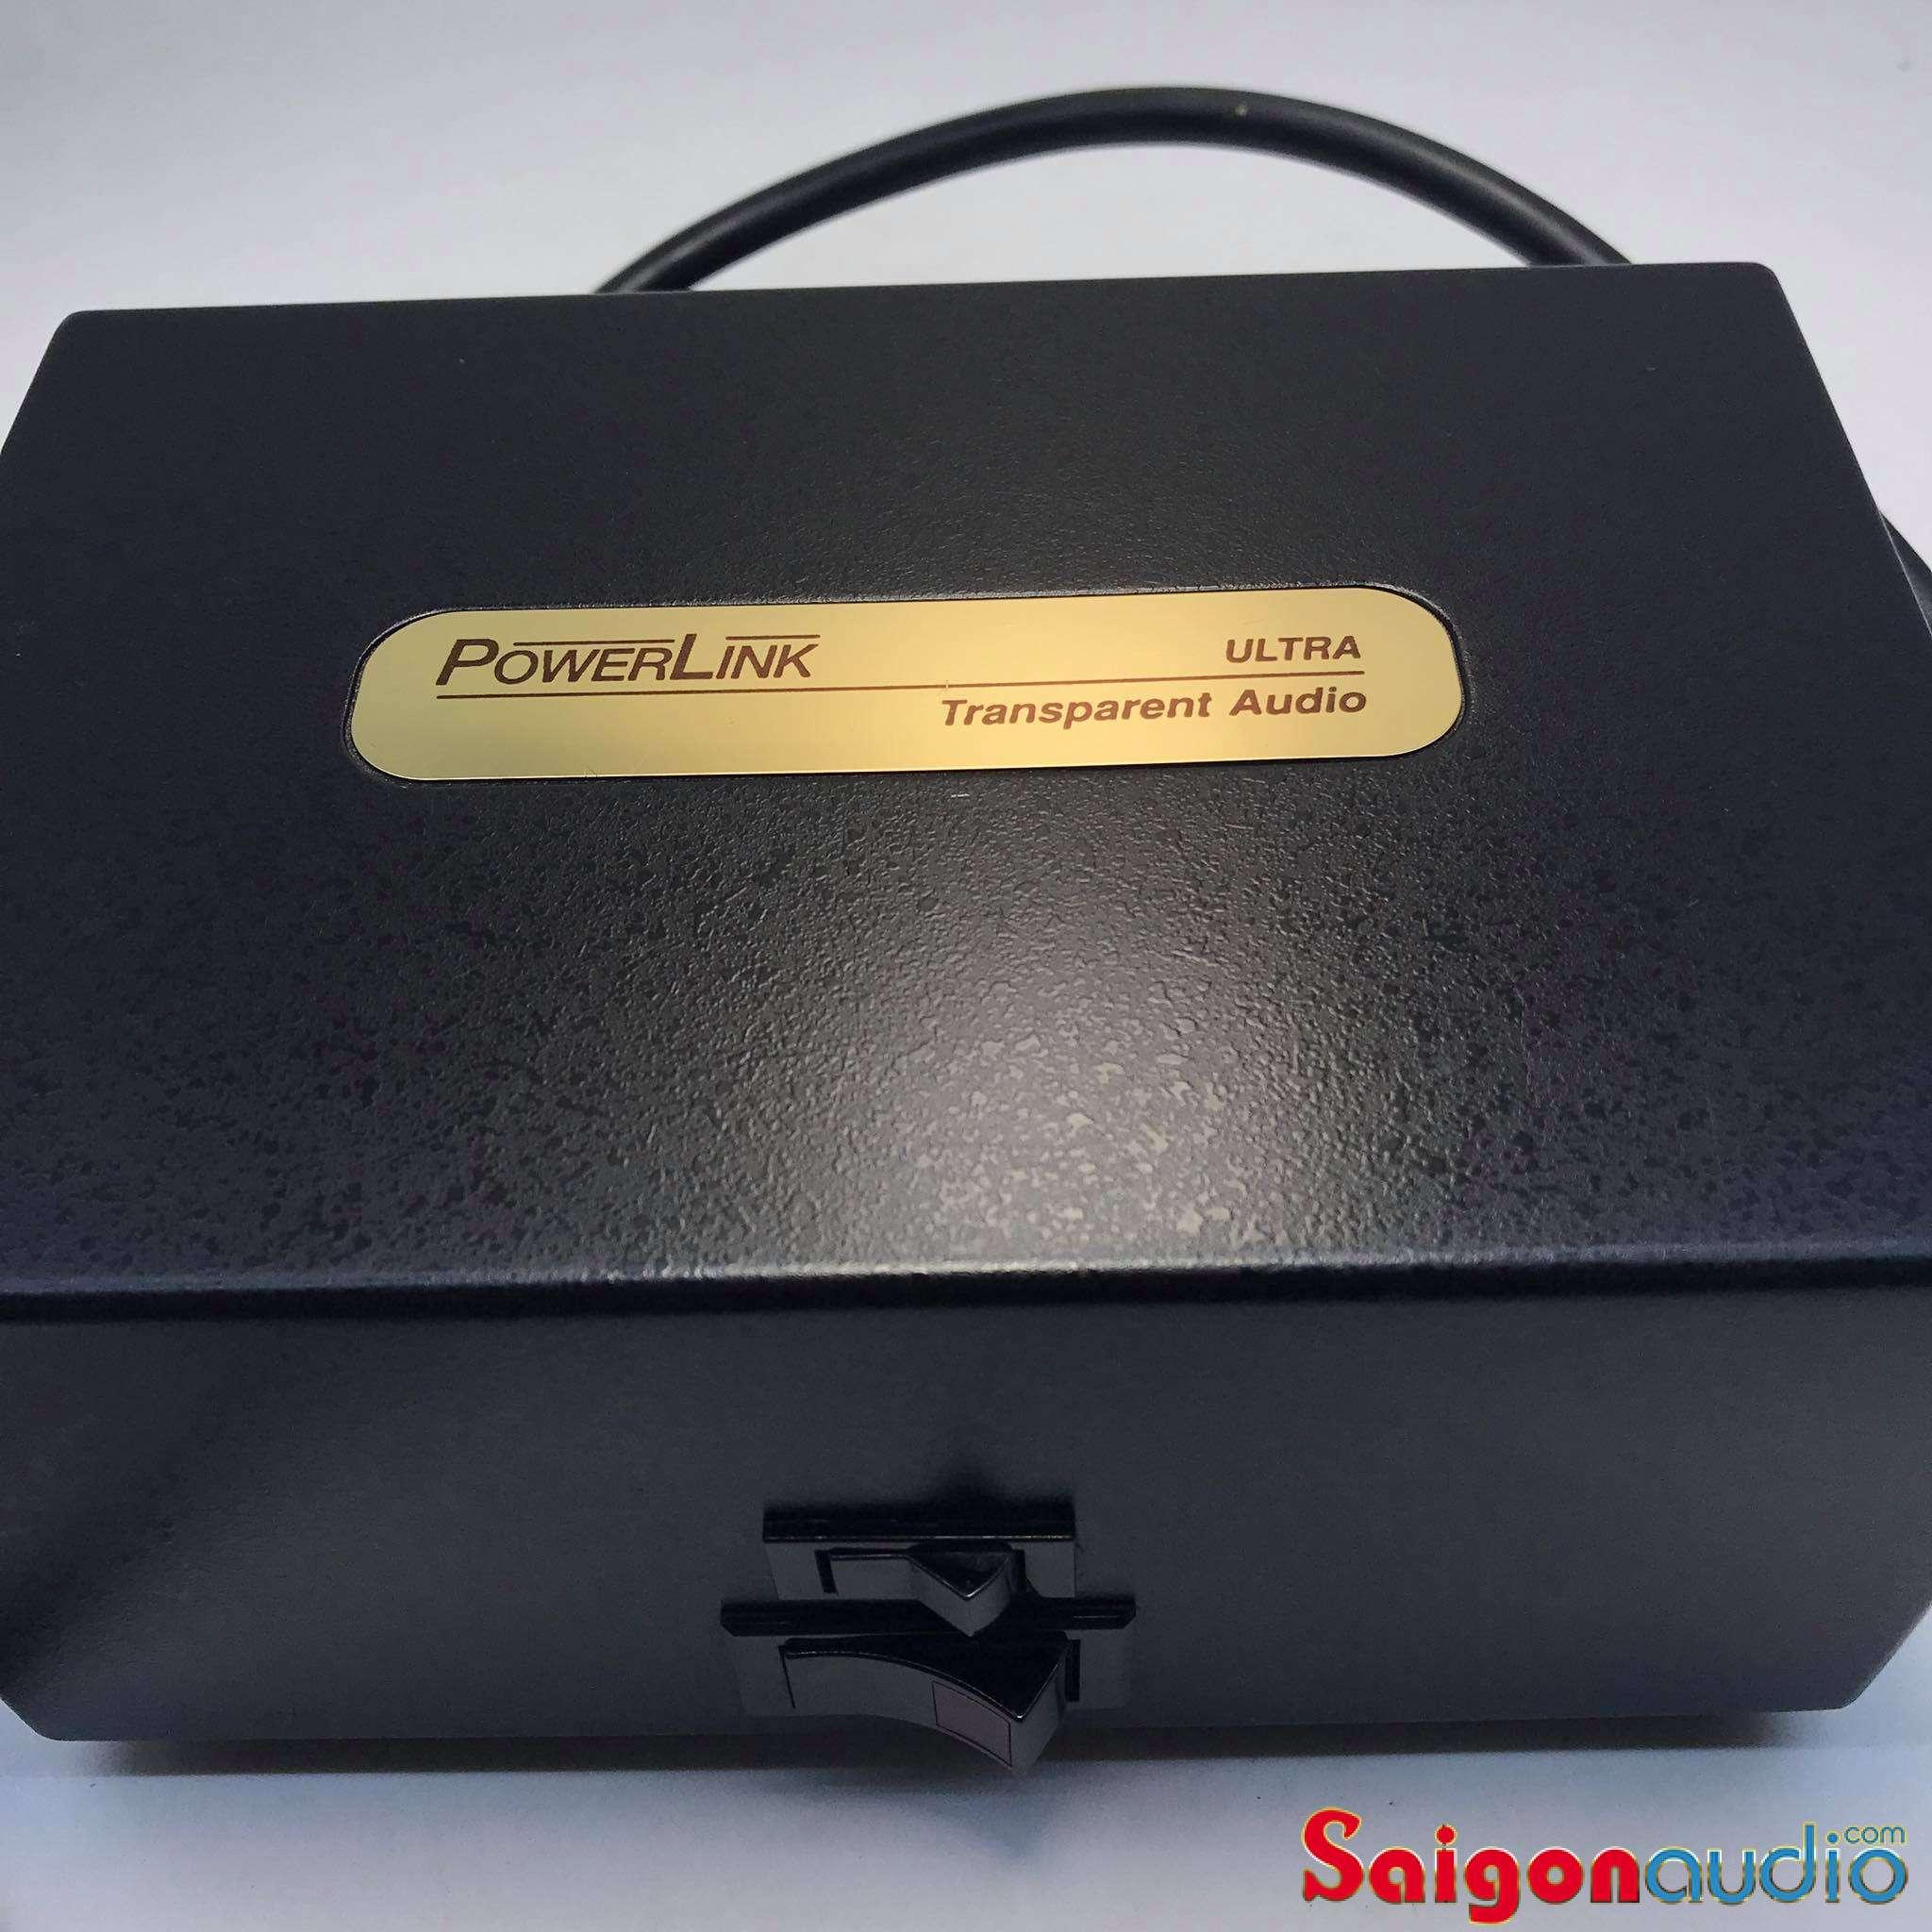 Lọc nguồn 8 ổ Transparent Audio Powerlink Ultra Power Conditioner